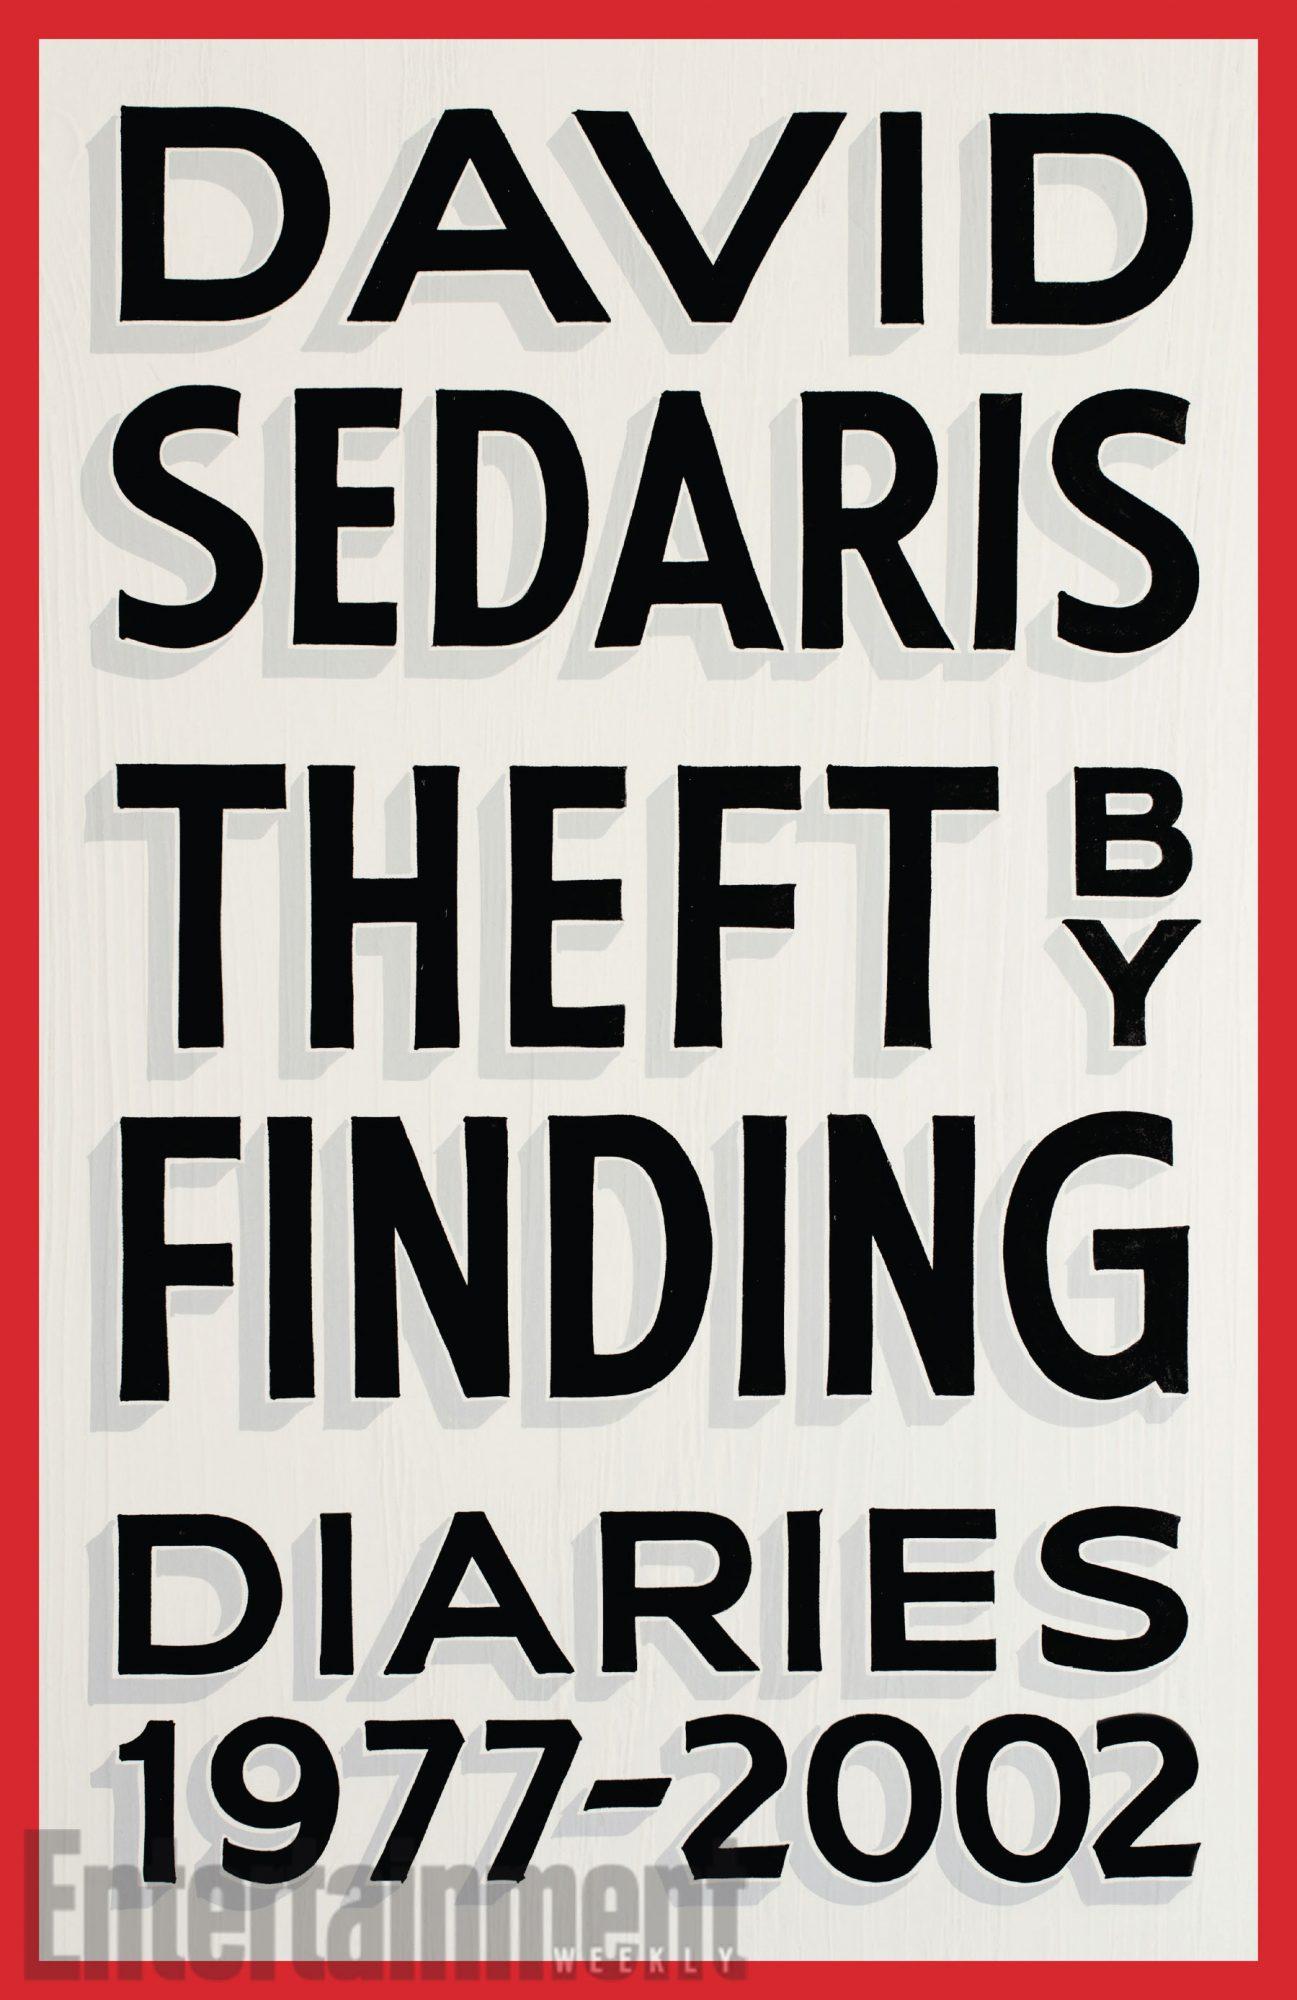 sedaris_theftbyfinding_no-texture-final-2